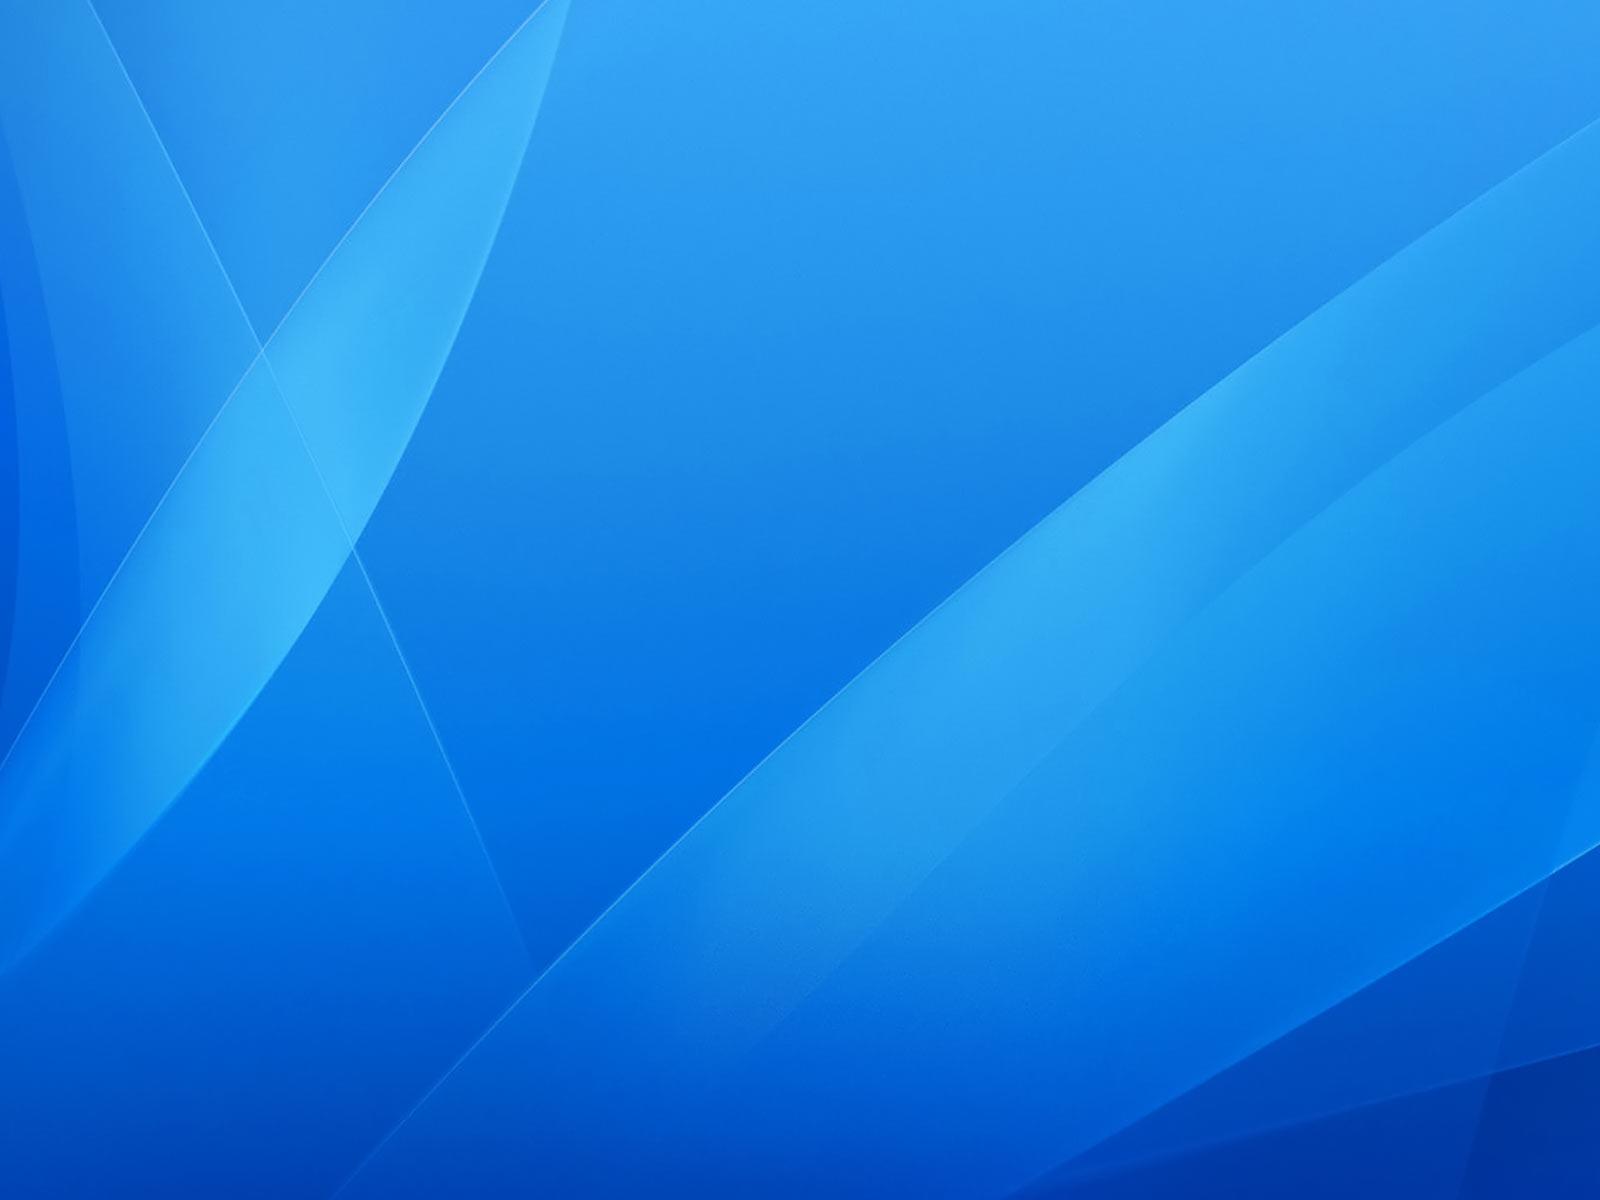 Windows 7 images Aqua Blue HD wallpaper and background 1600x1200